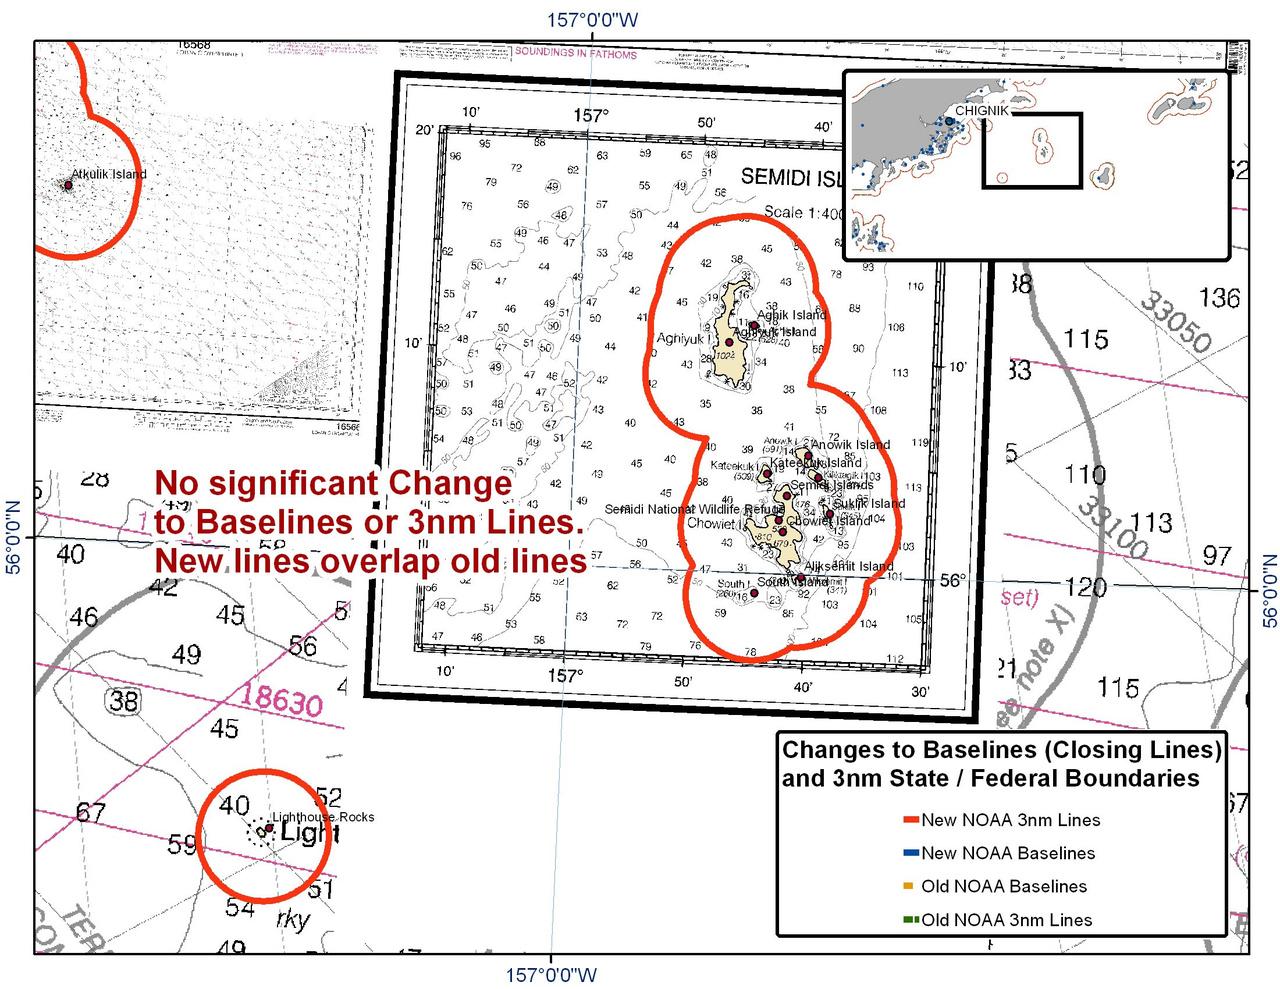 Chart for the Semidi Islands